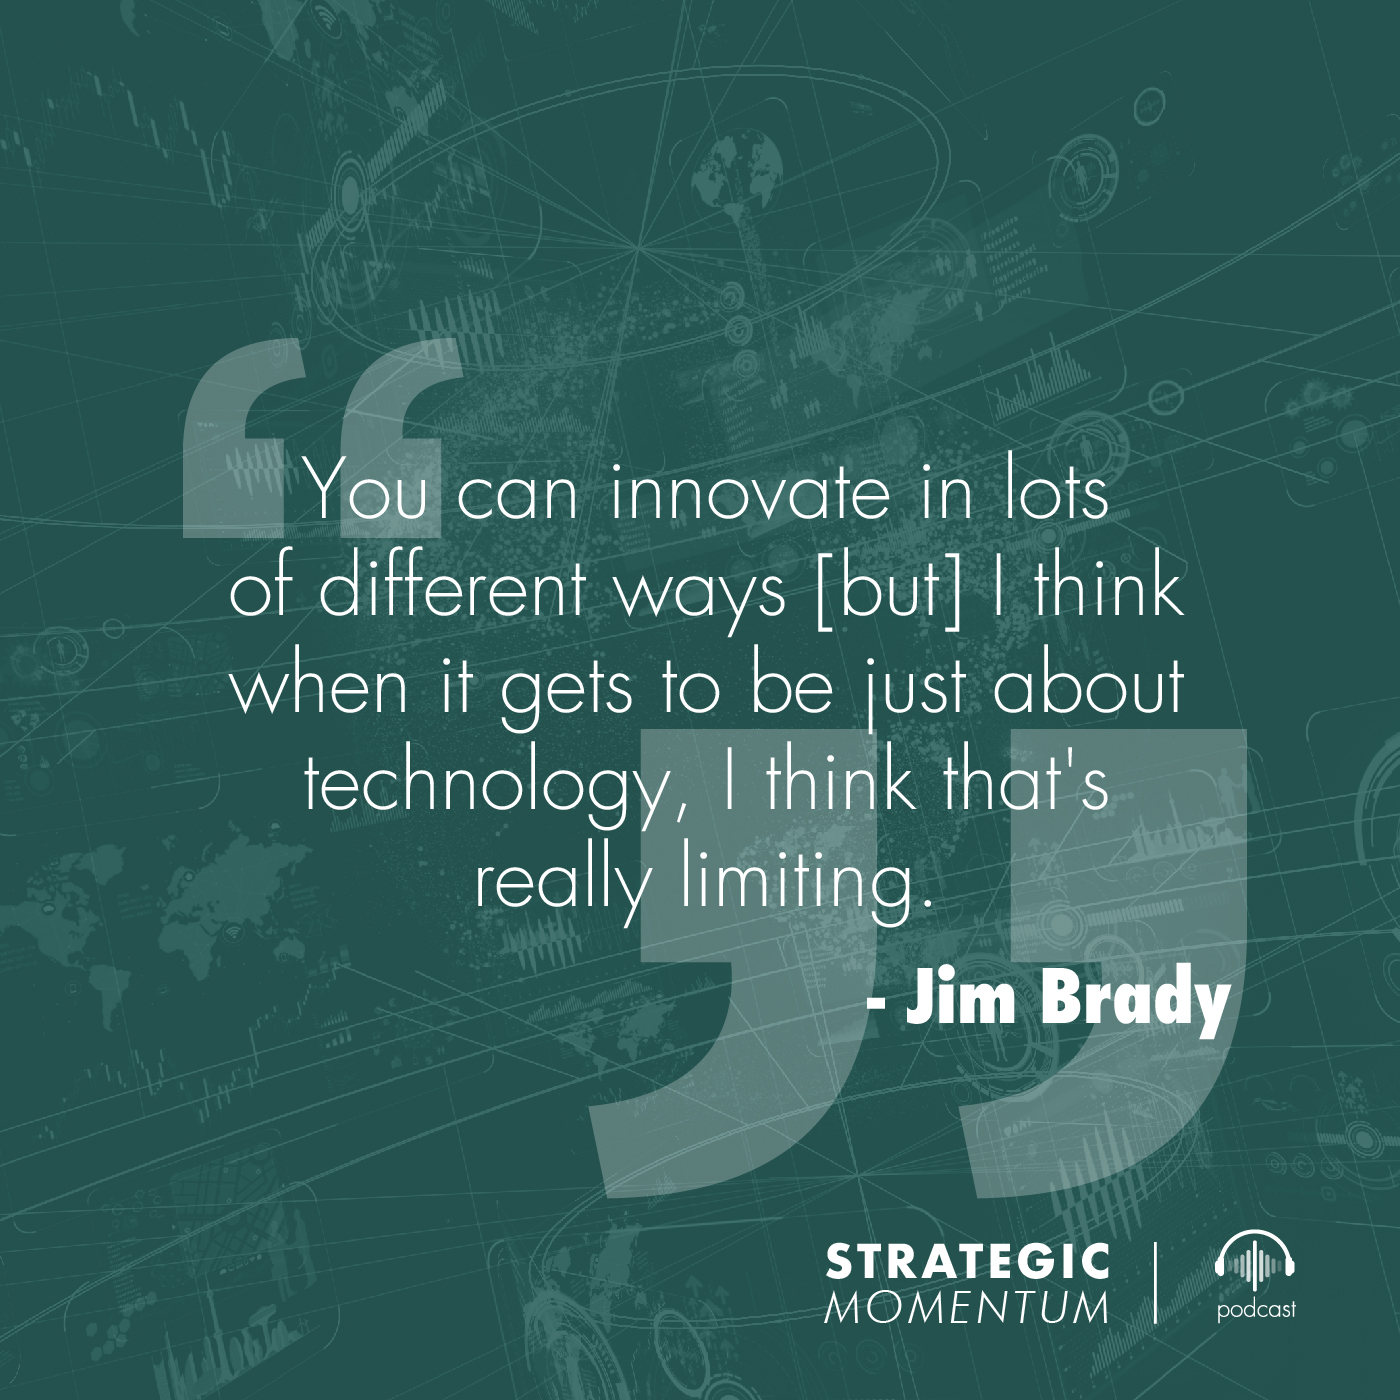 Jim Brady Quote | Strategic Momentum Podcast